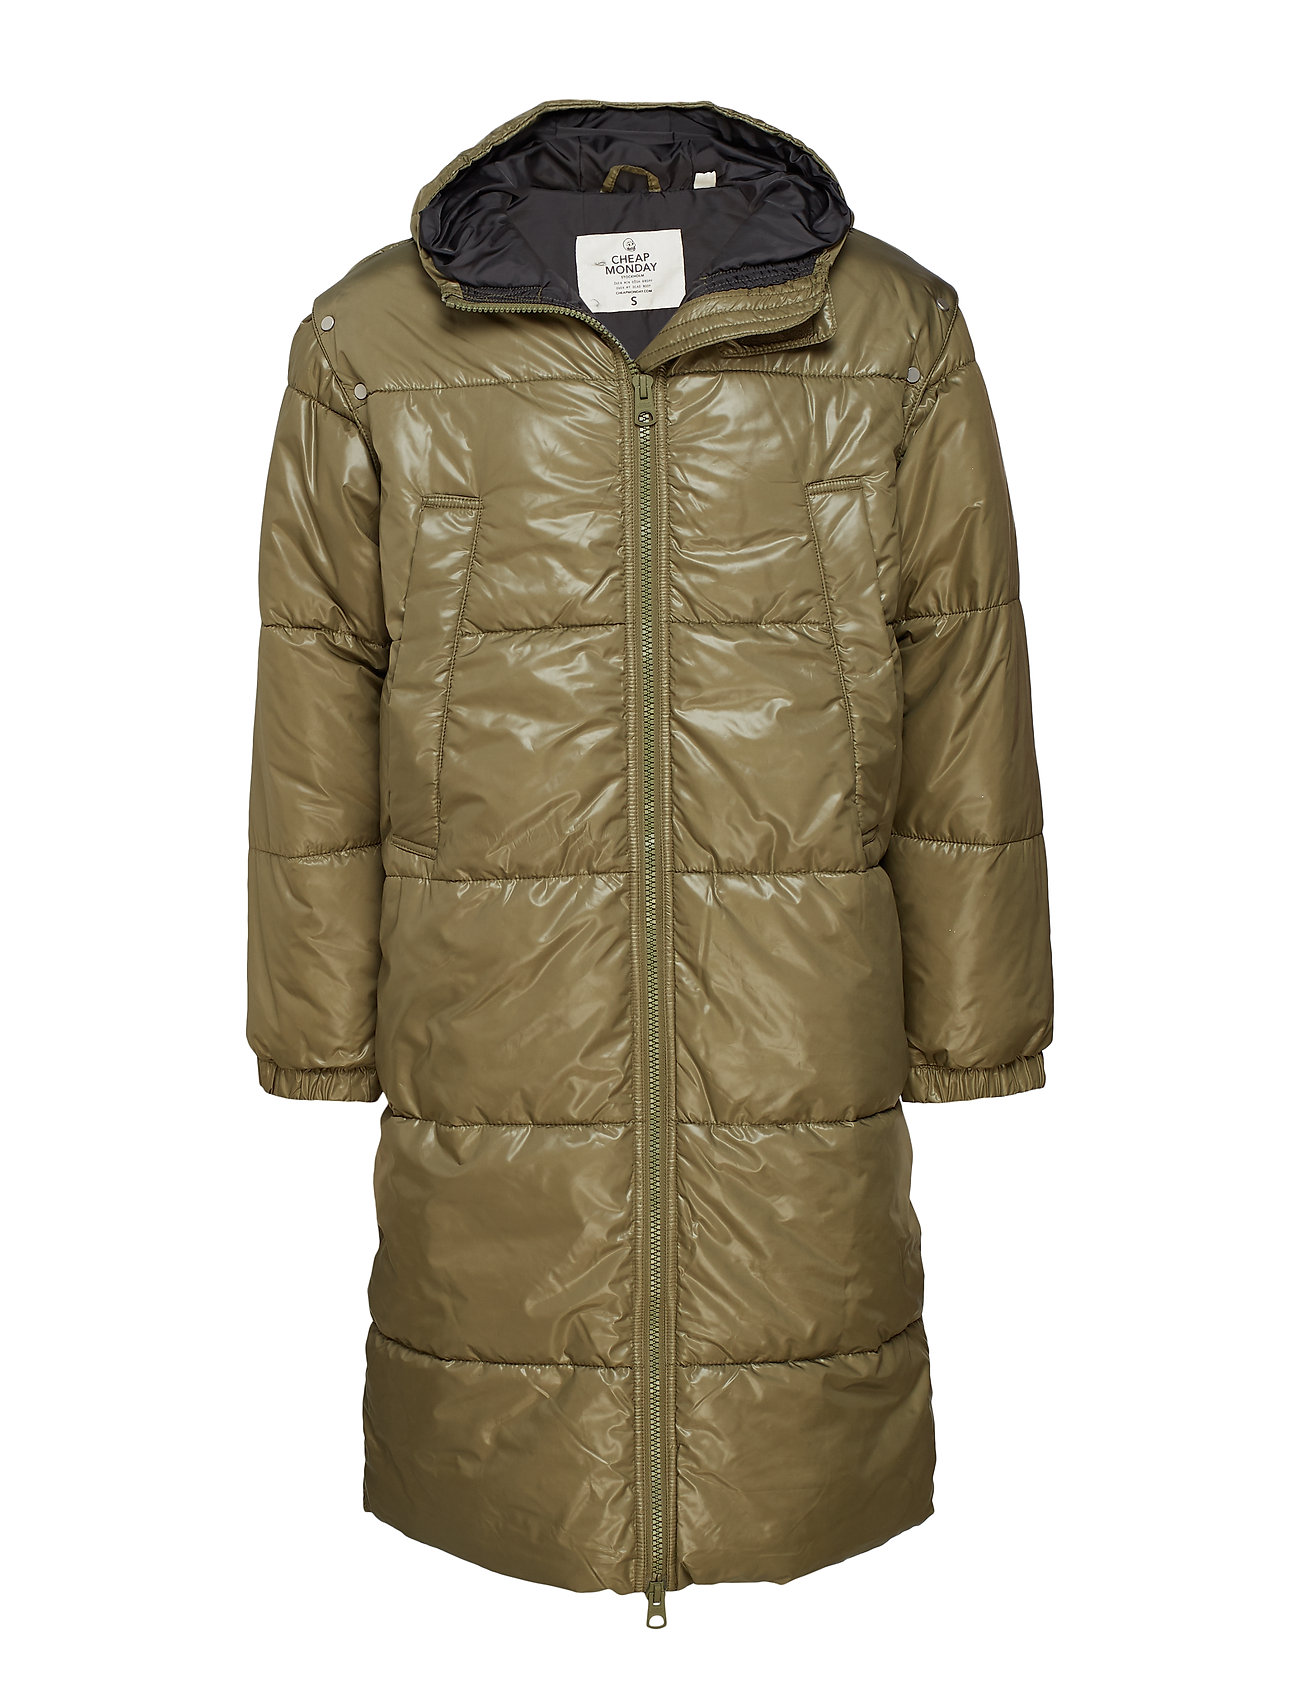 Cheap Monday Sleeping coat Chp mnd sender - KHAKI GREE